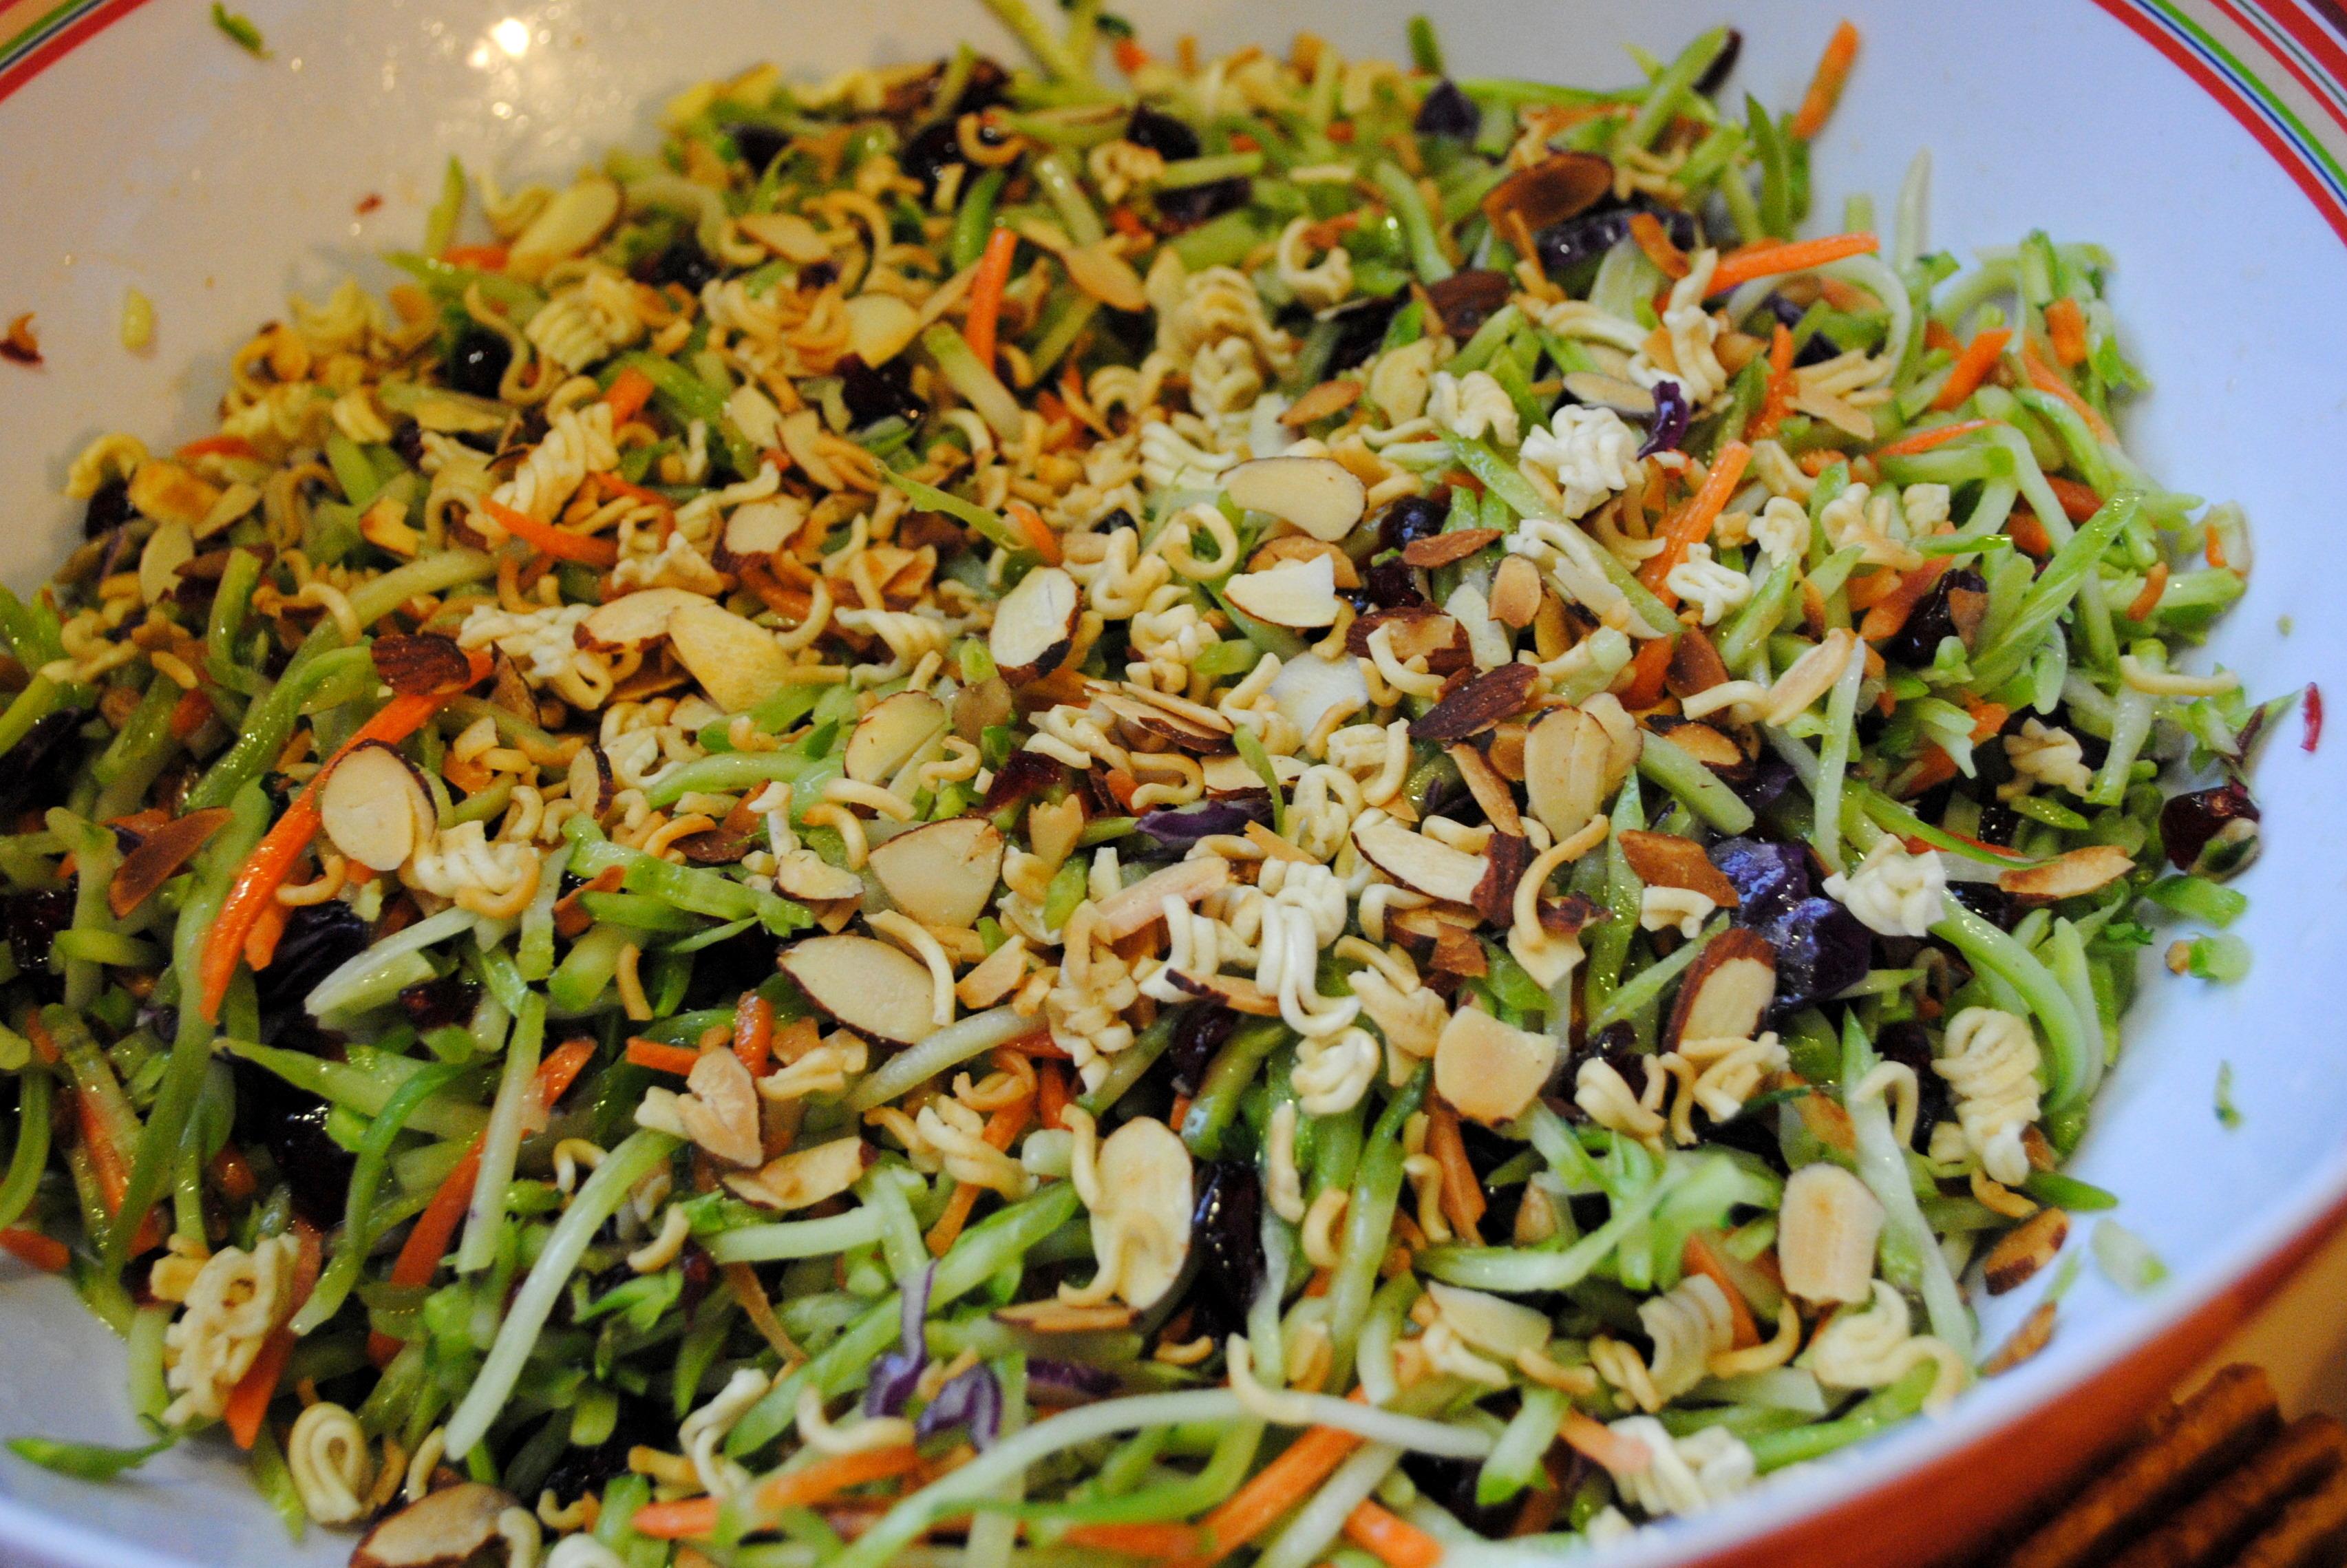 ramen noodle coleslaw with sunflower seeds